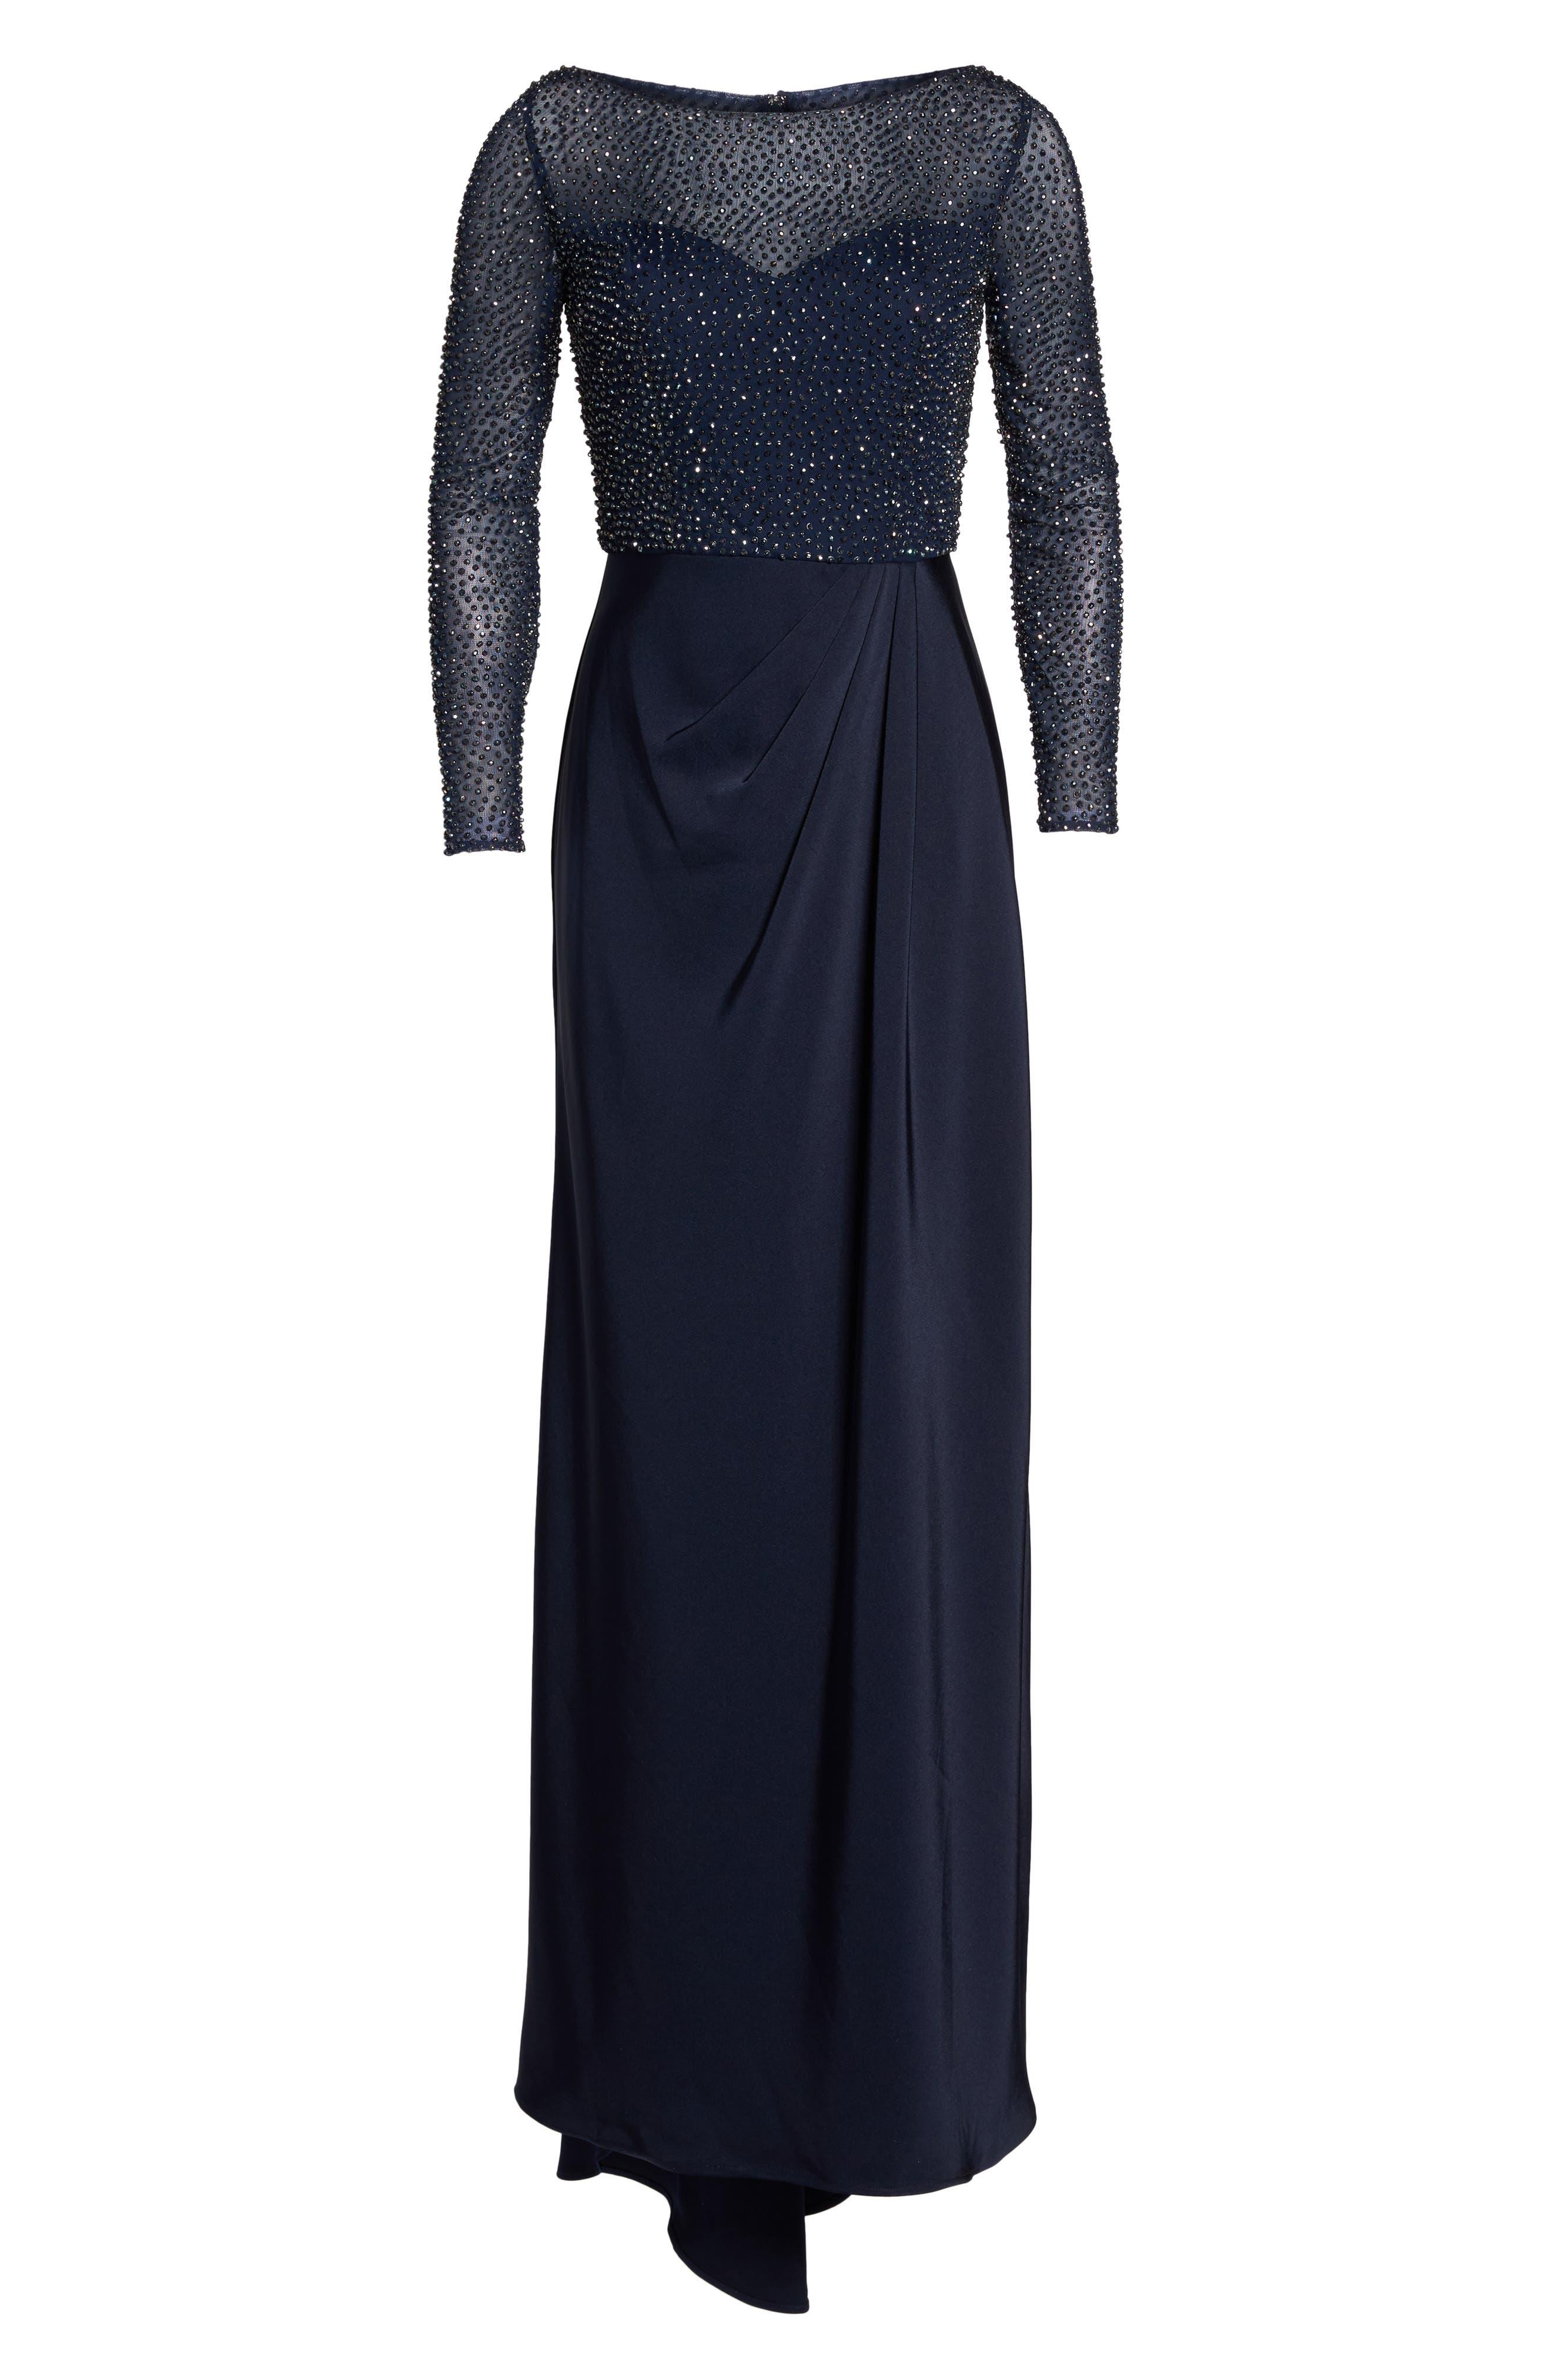 LA FEMME, Bead Embellished Gown, Alternate thumbnail 6, color, NAVY